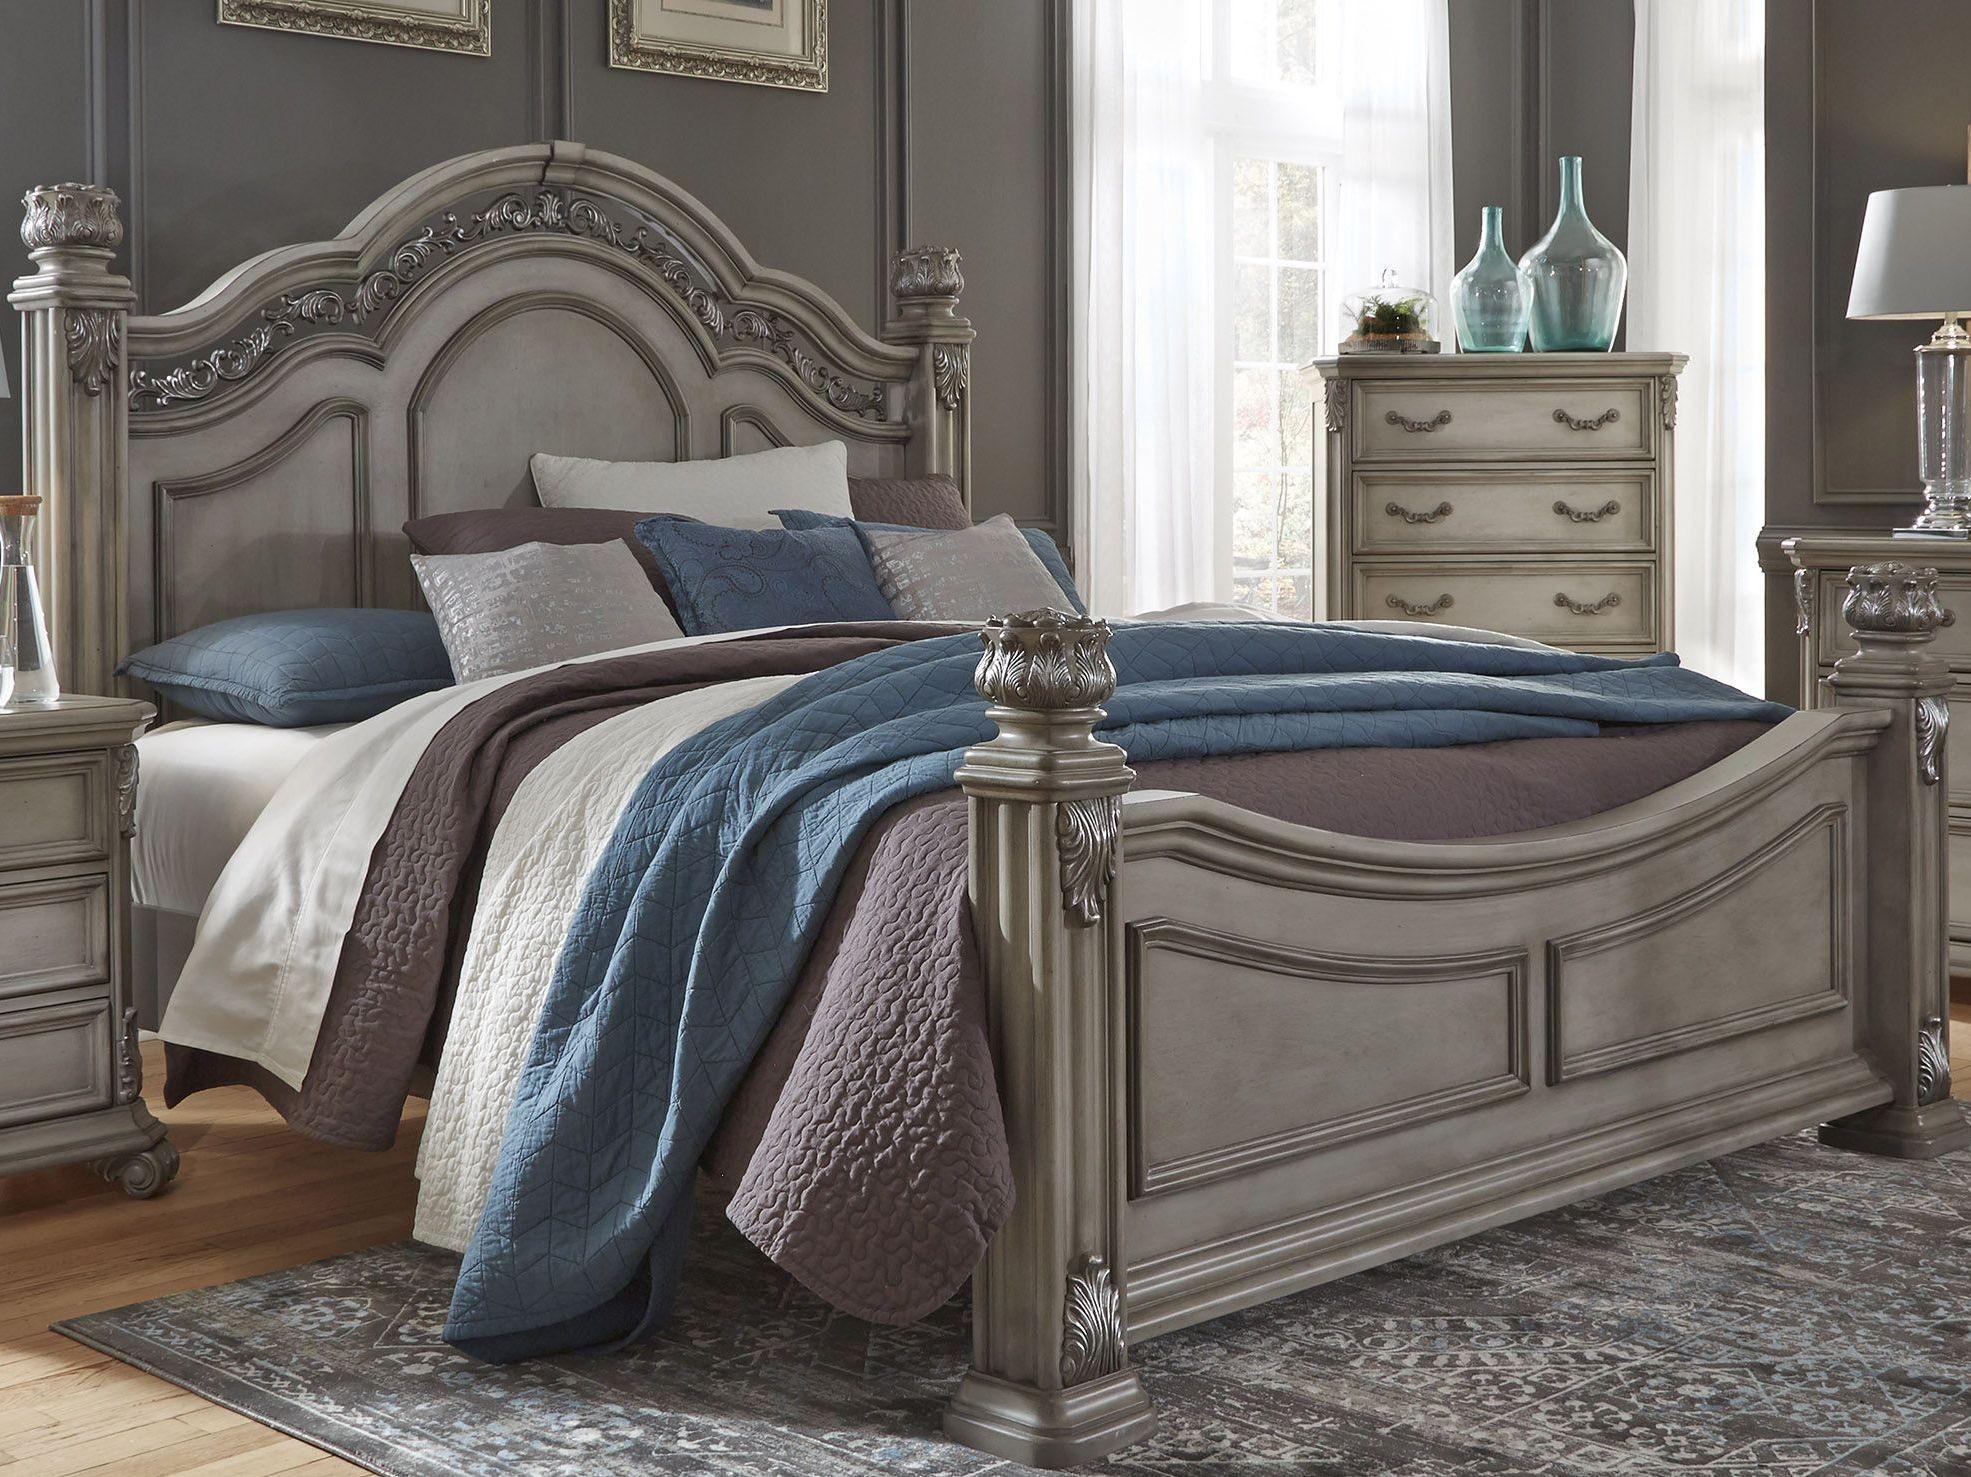 Messina Estates Bedroom Gray Poster Bedroom Set From Liberty Coleman Furniture